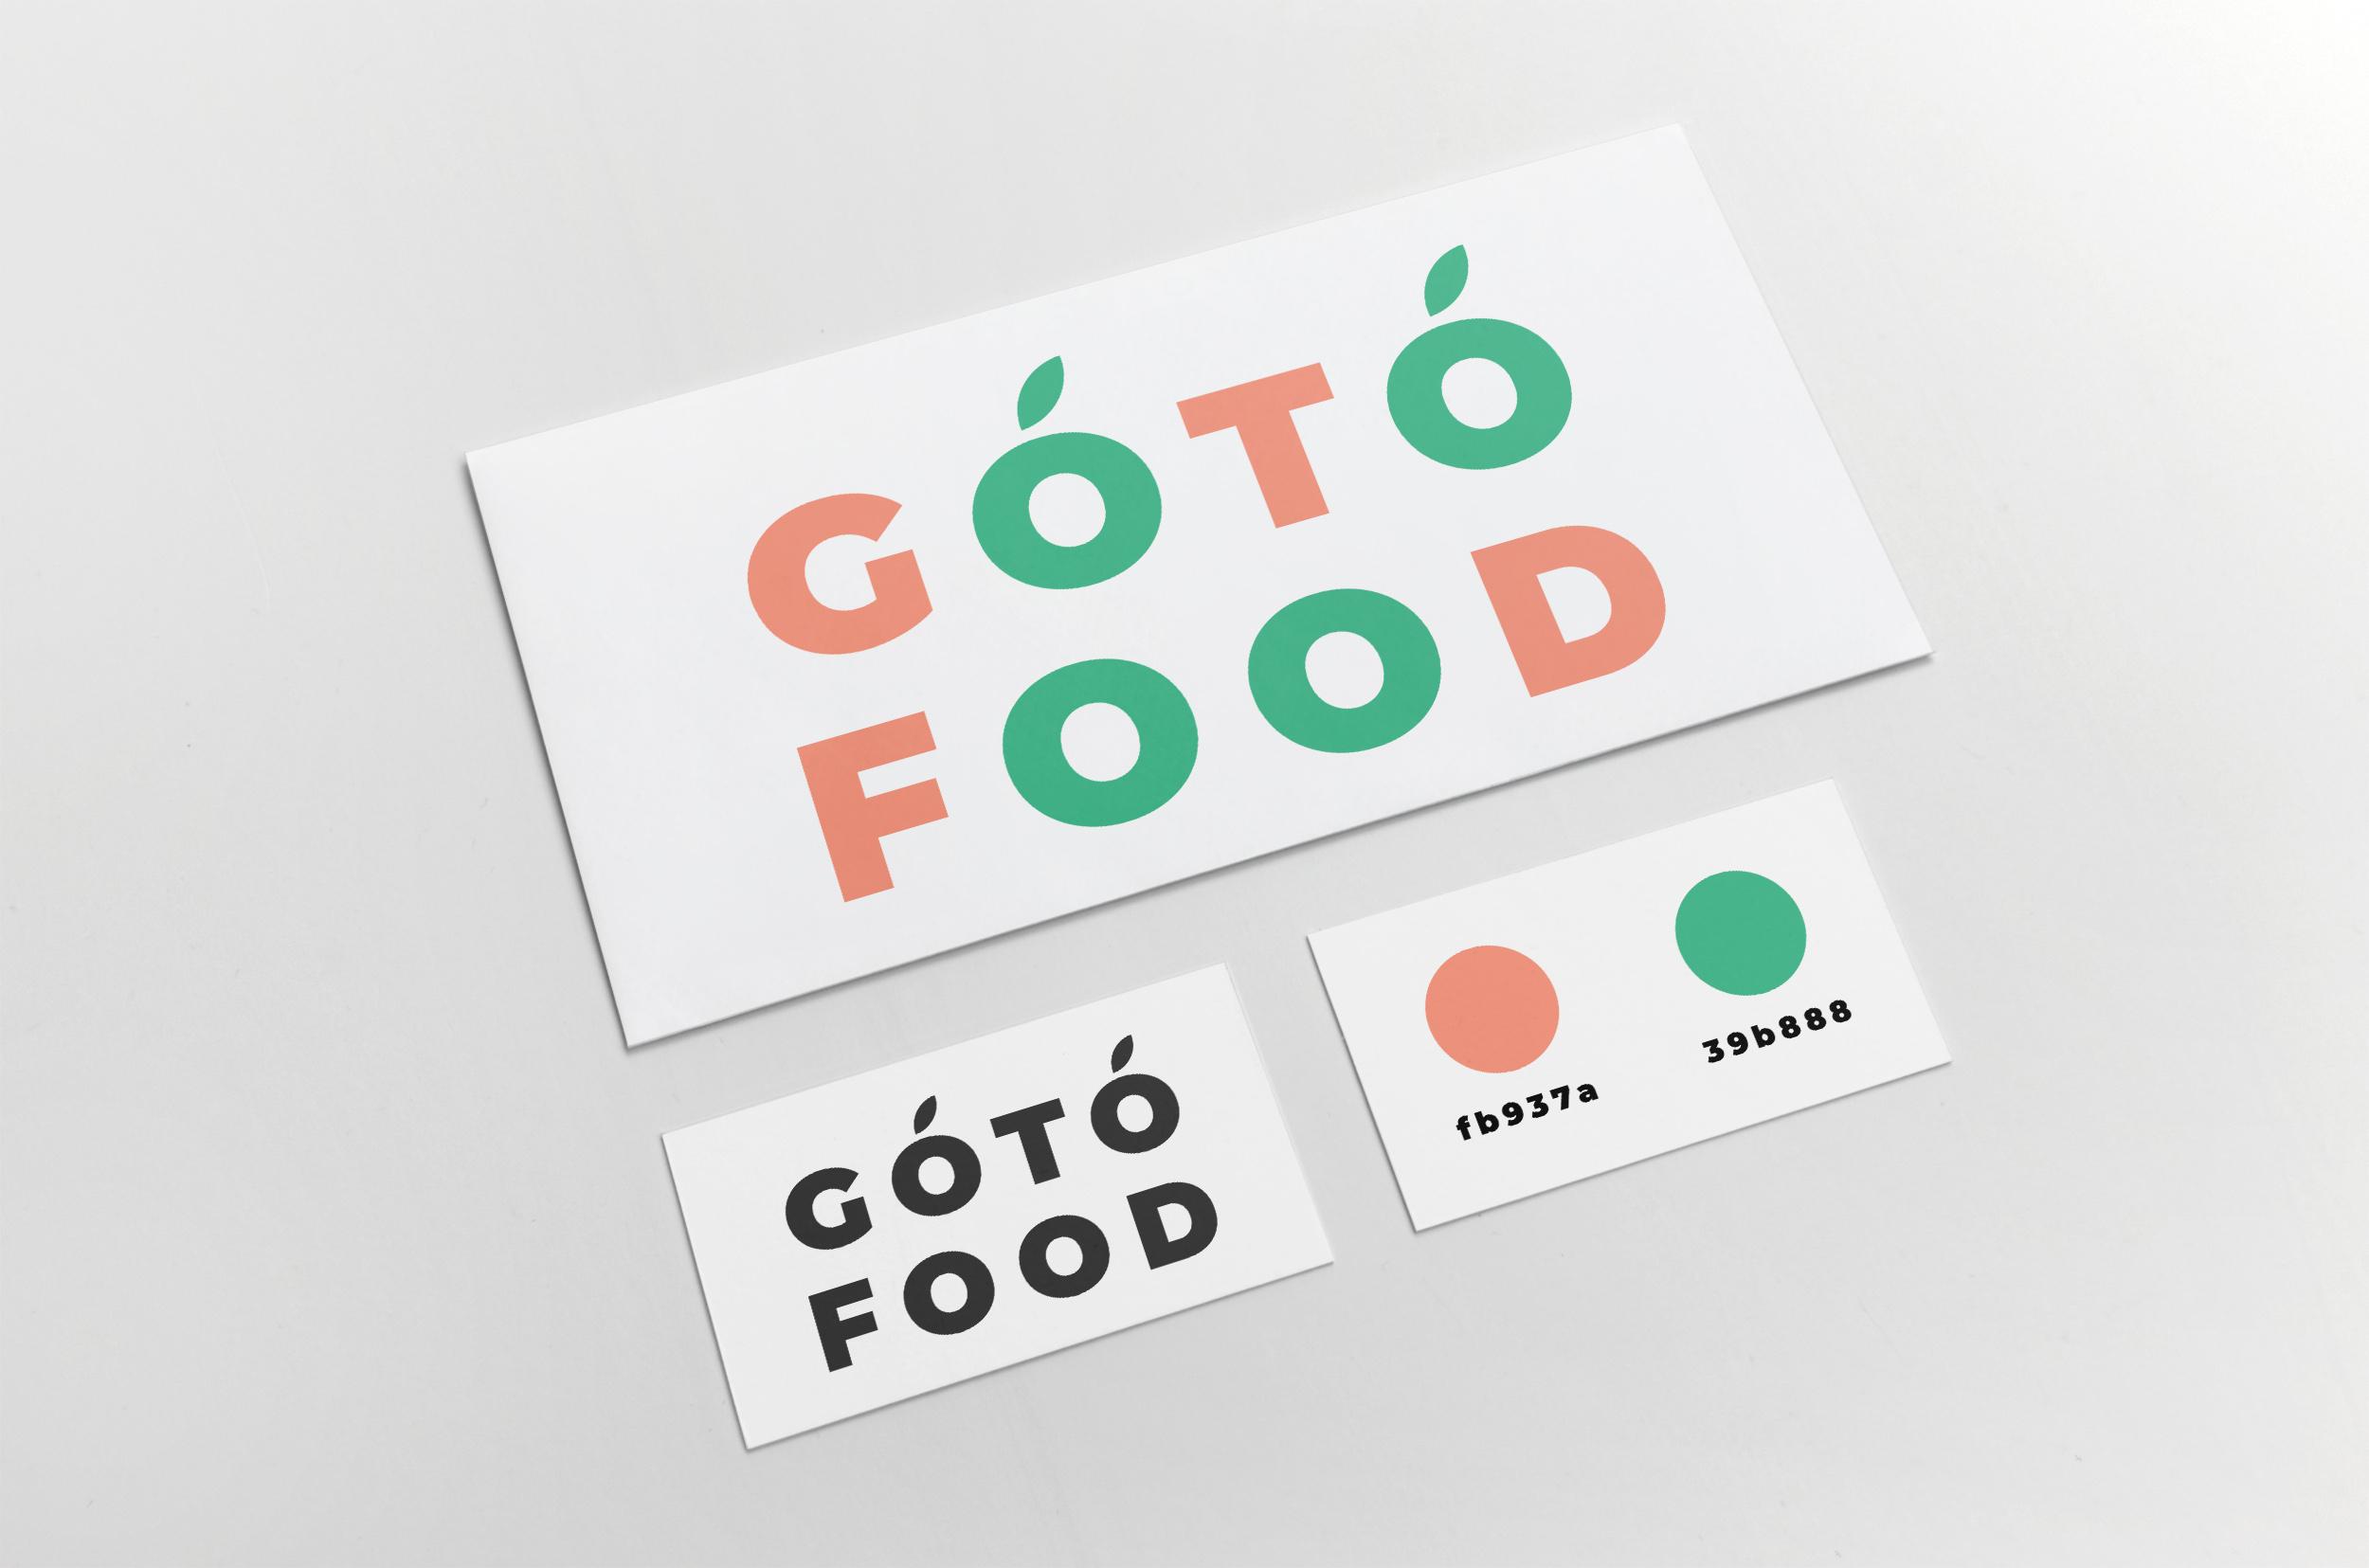 Логотип интернет-магазина здоровой еды фото f_7005cd7be292b5c5.jpg